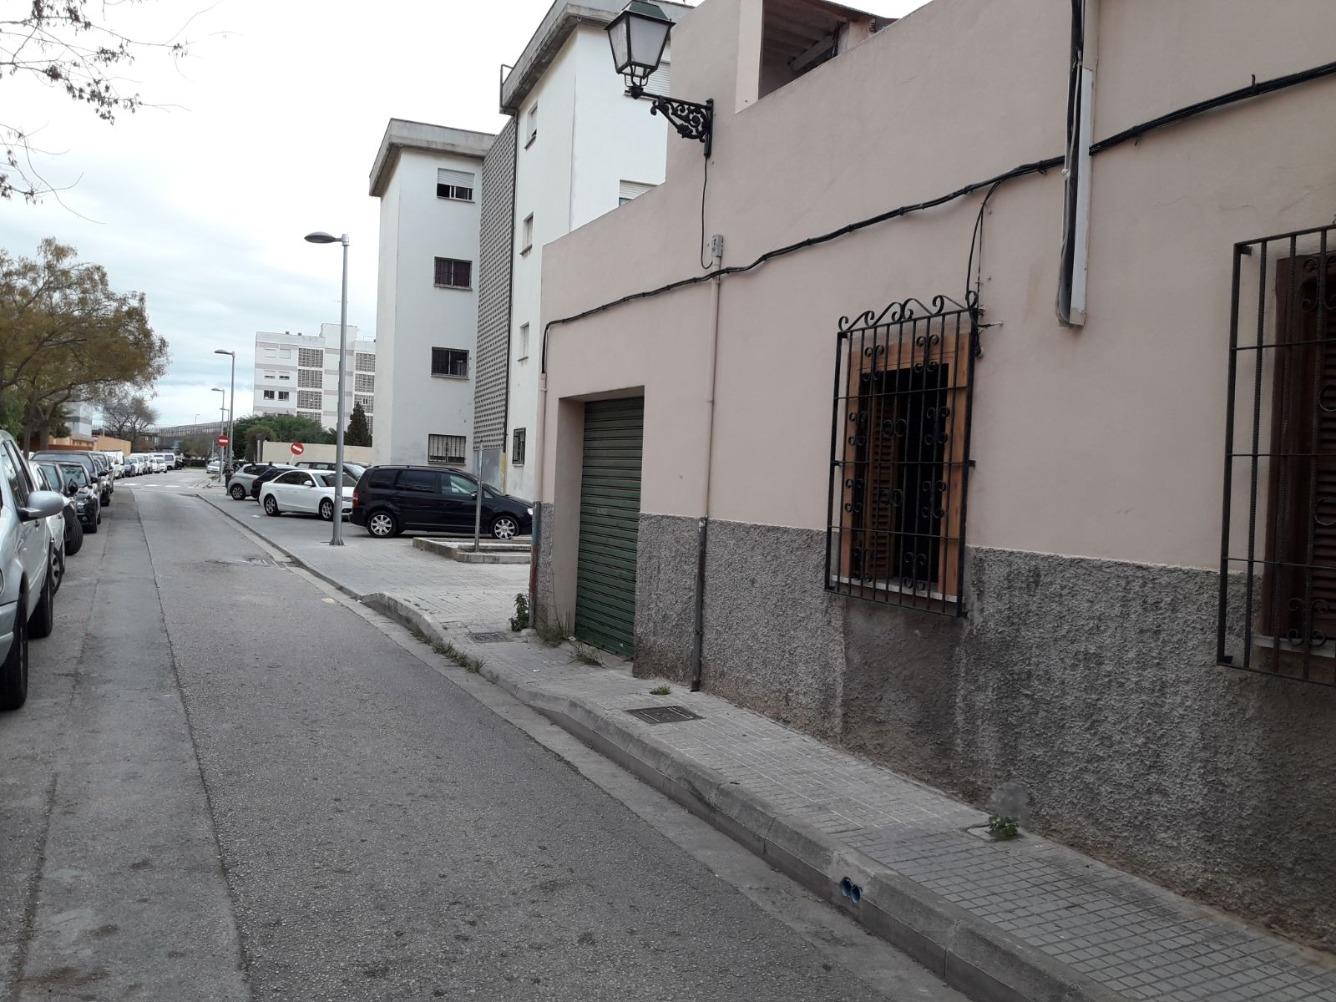 Ground floor for sale in Llevant - La Soledat Sud